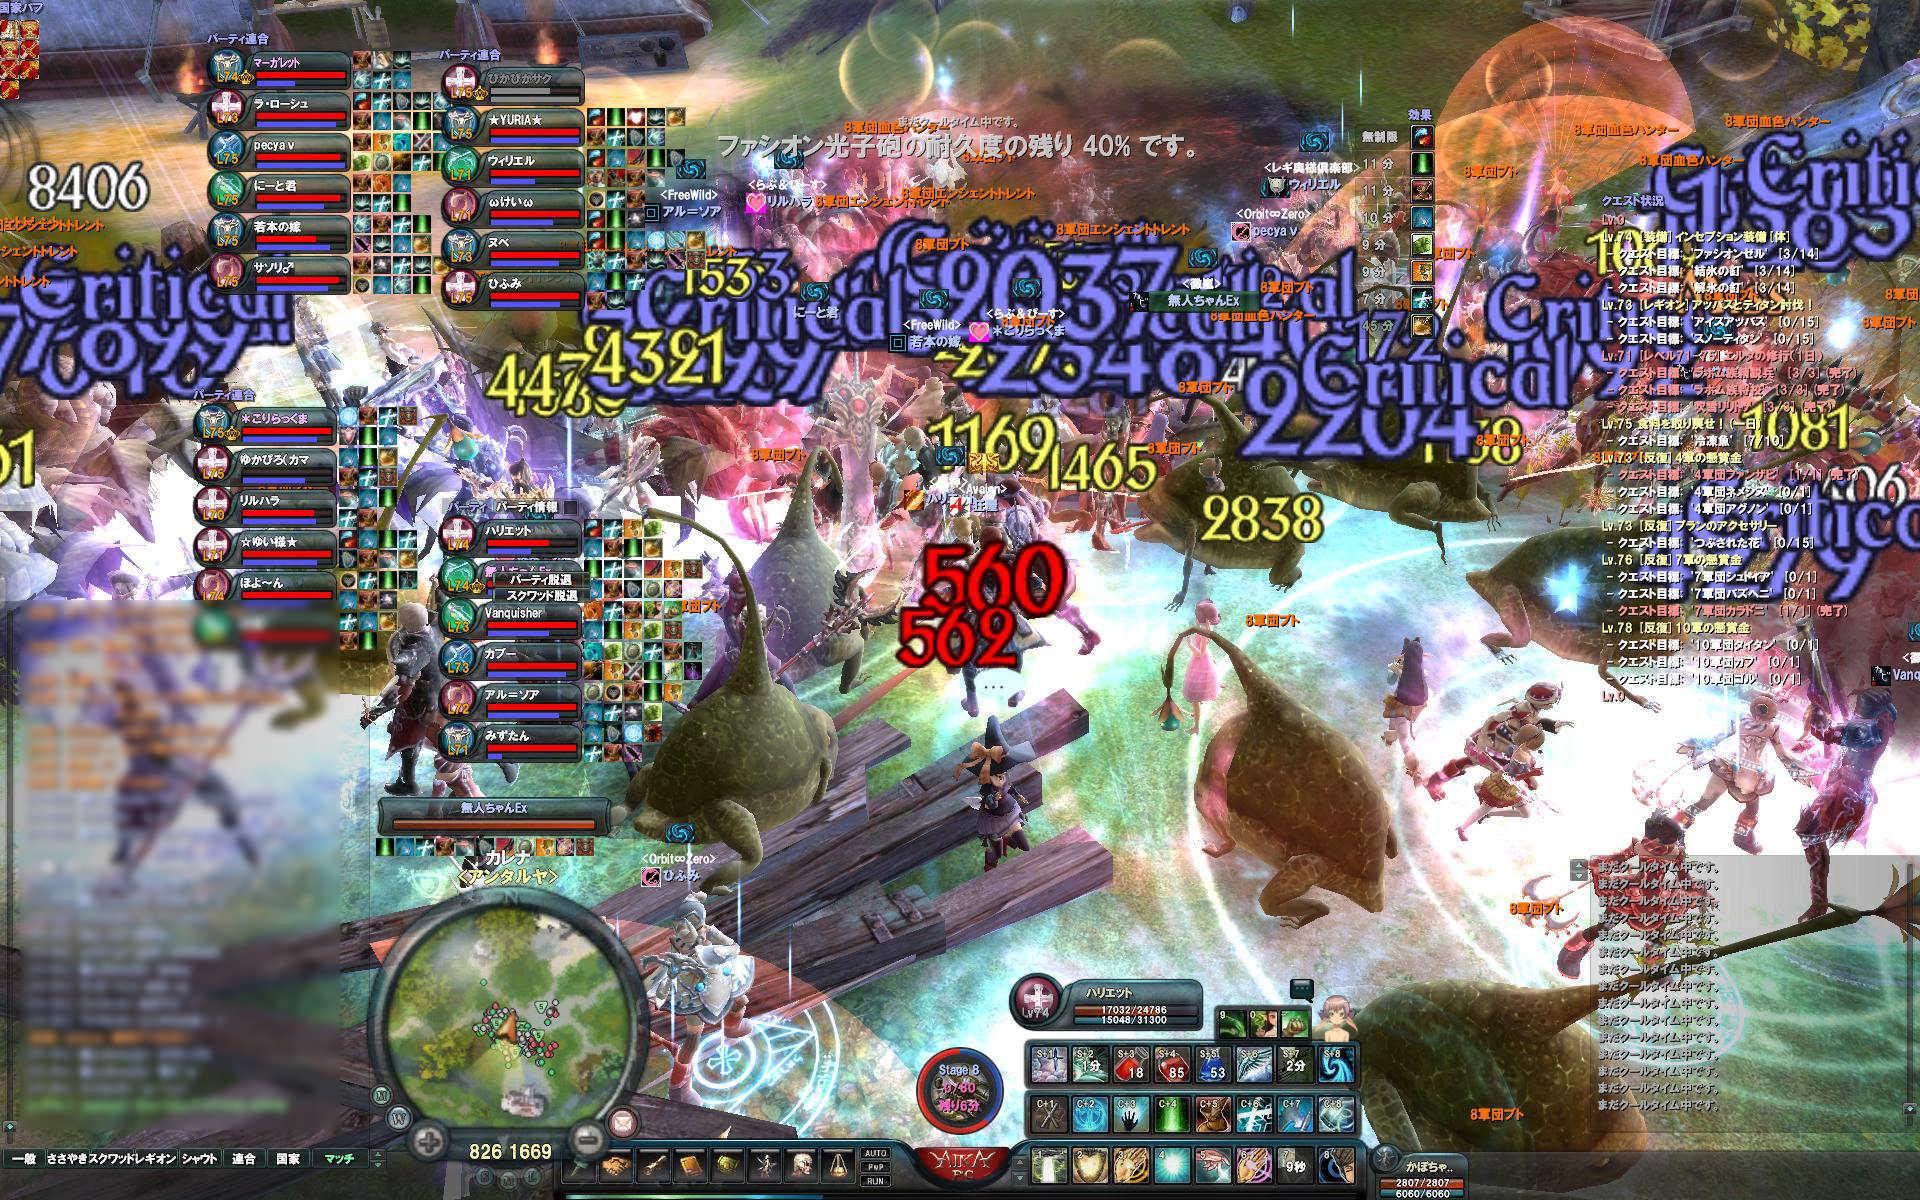 pcss20110530_003.jpg